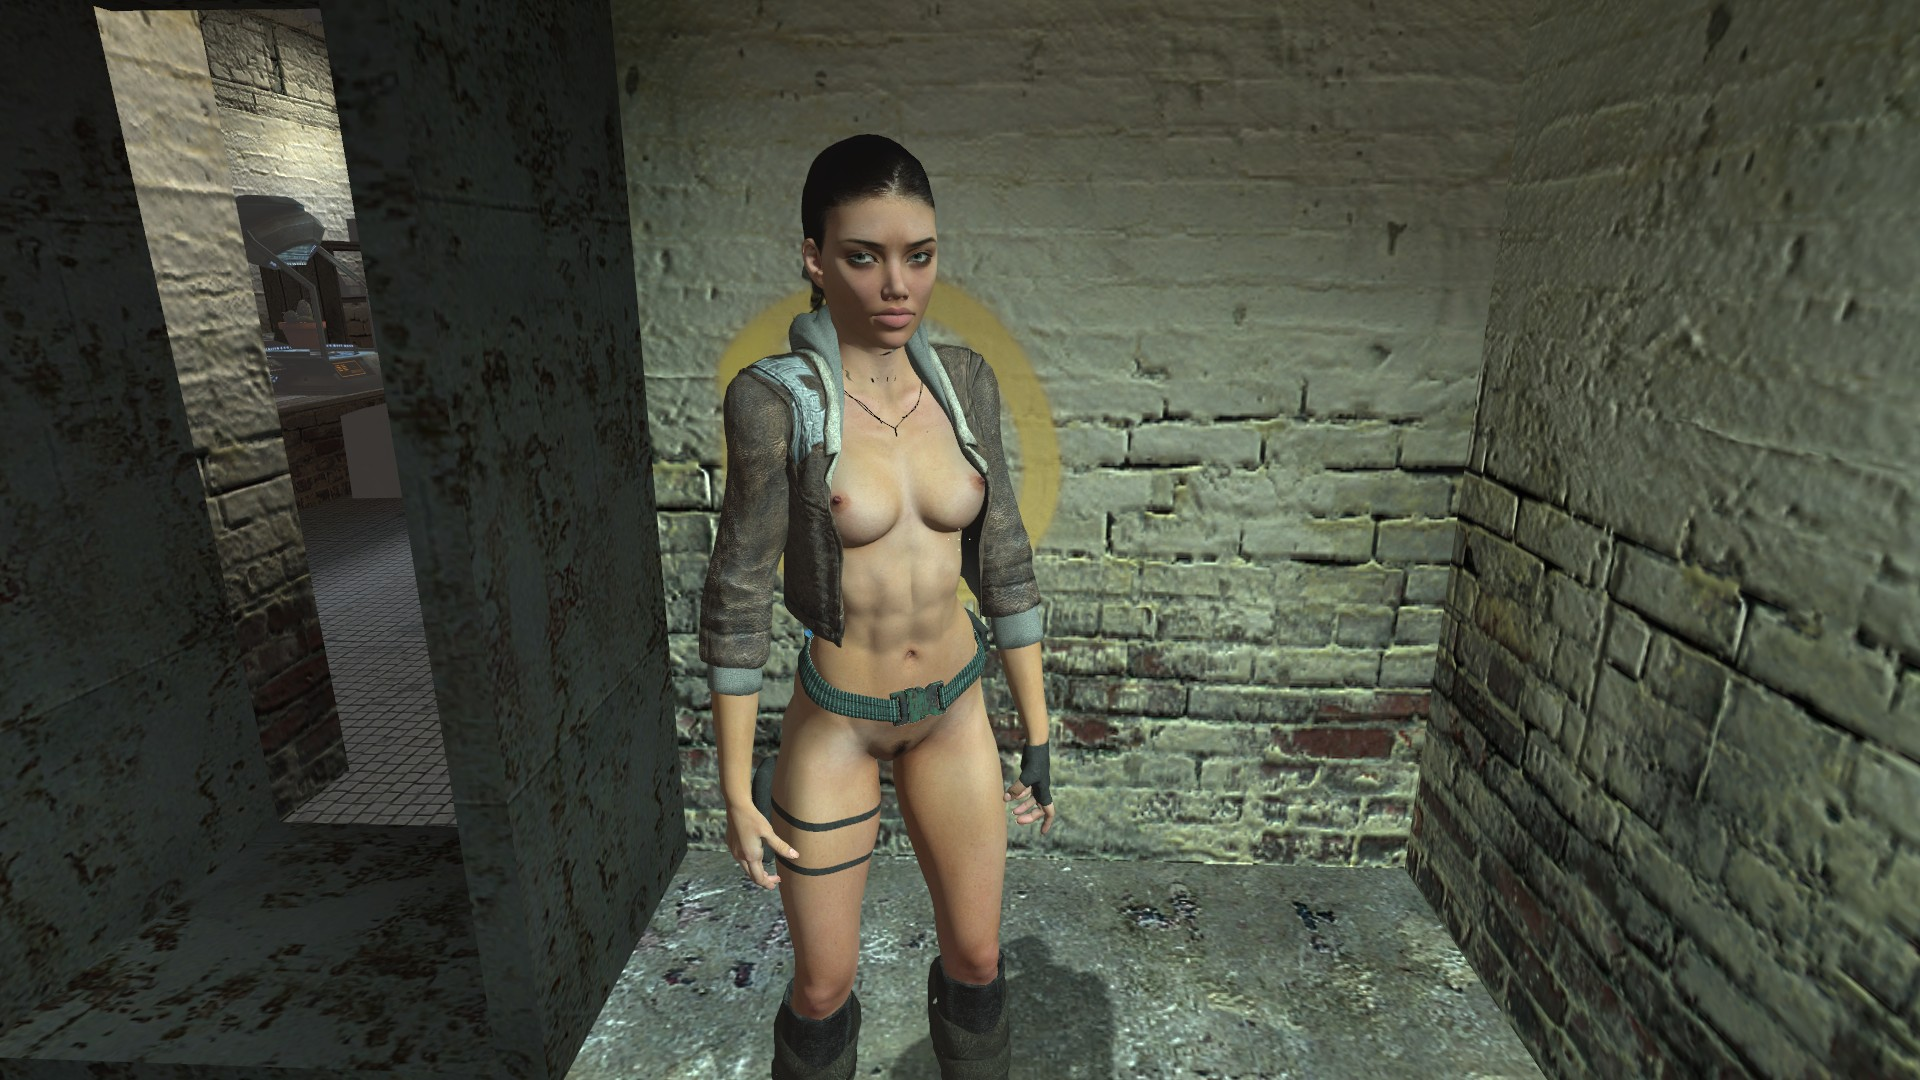 Half Life Nude Mod